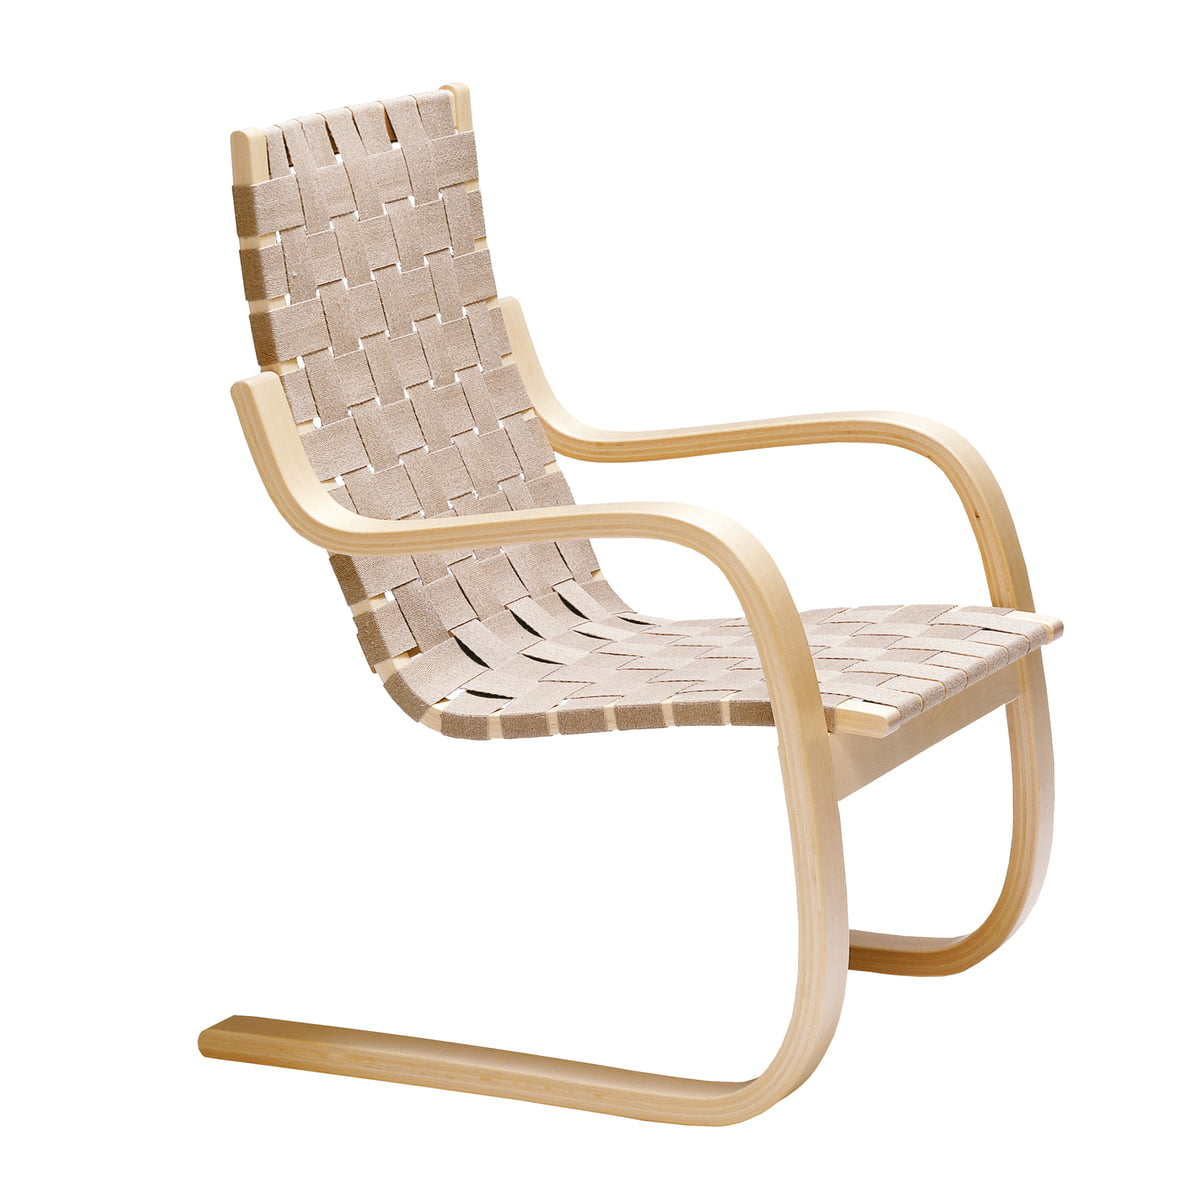 Sessel 406 Von Artek Connox Shop